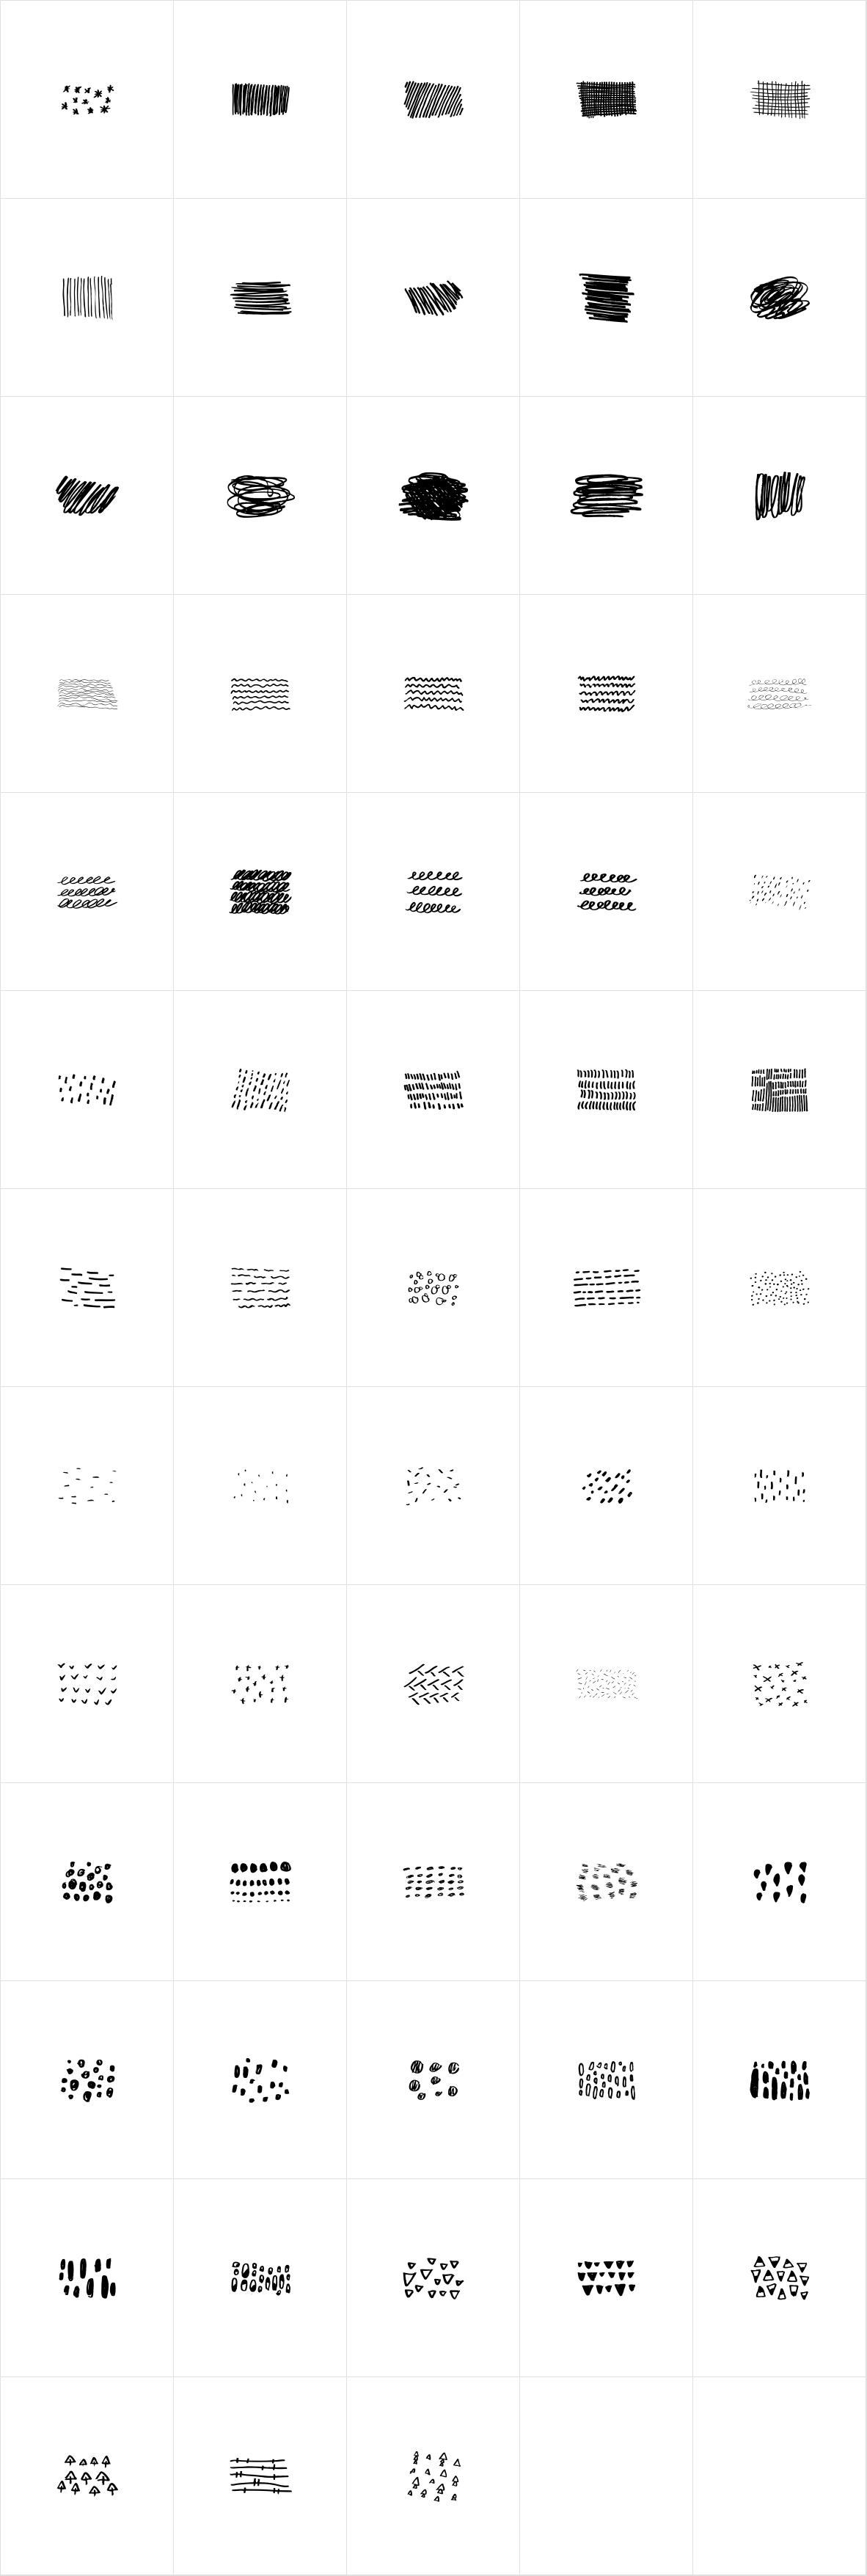 Noyh A Hand Pattern